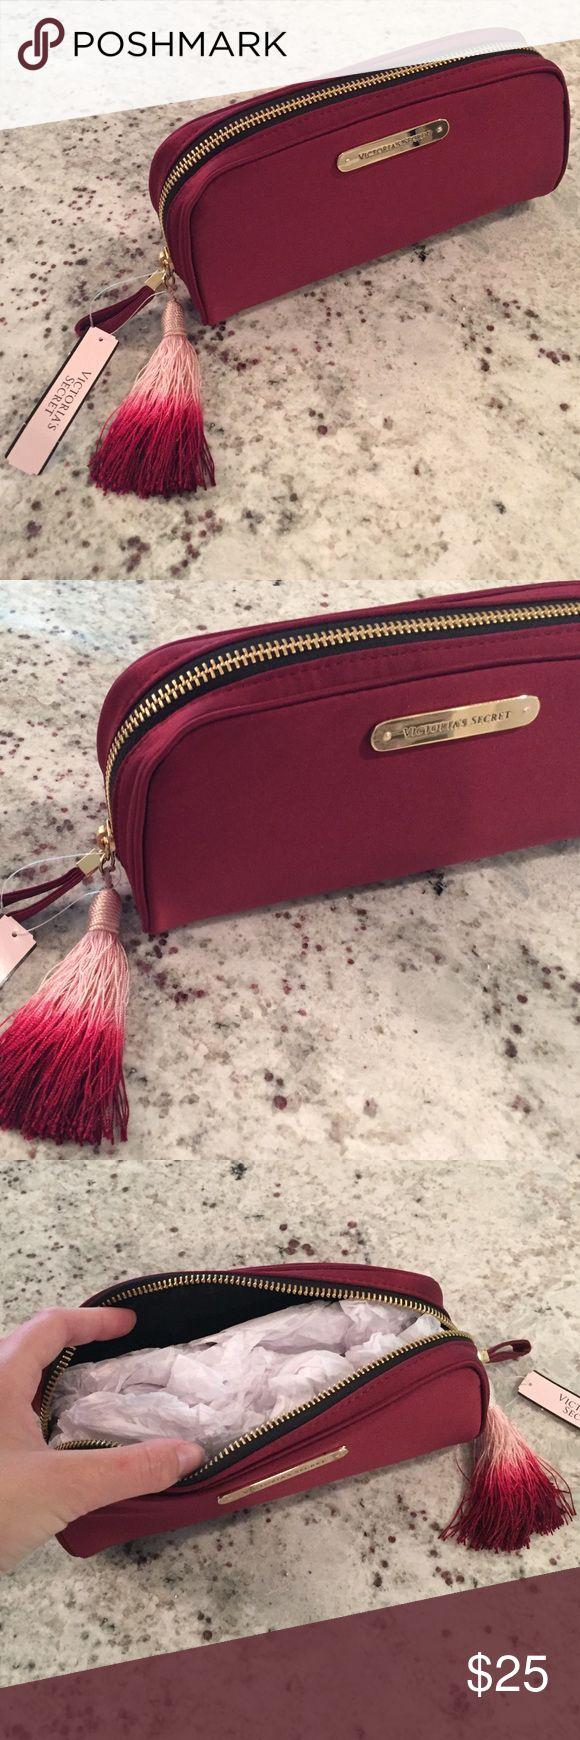 NEW Victoria Secret makeup bag NWT maroon Victoria's Secret makeup bag. 8in x 4in. Victoria's Secret Bags Cosmetic Bags & Cases